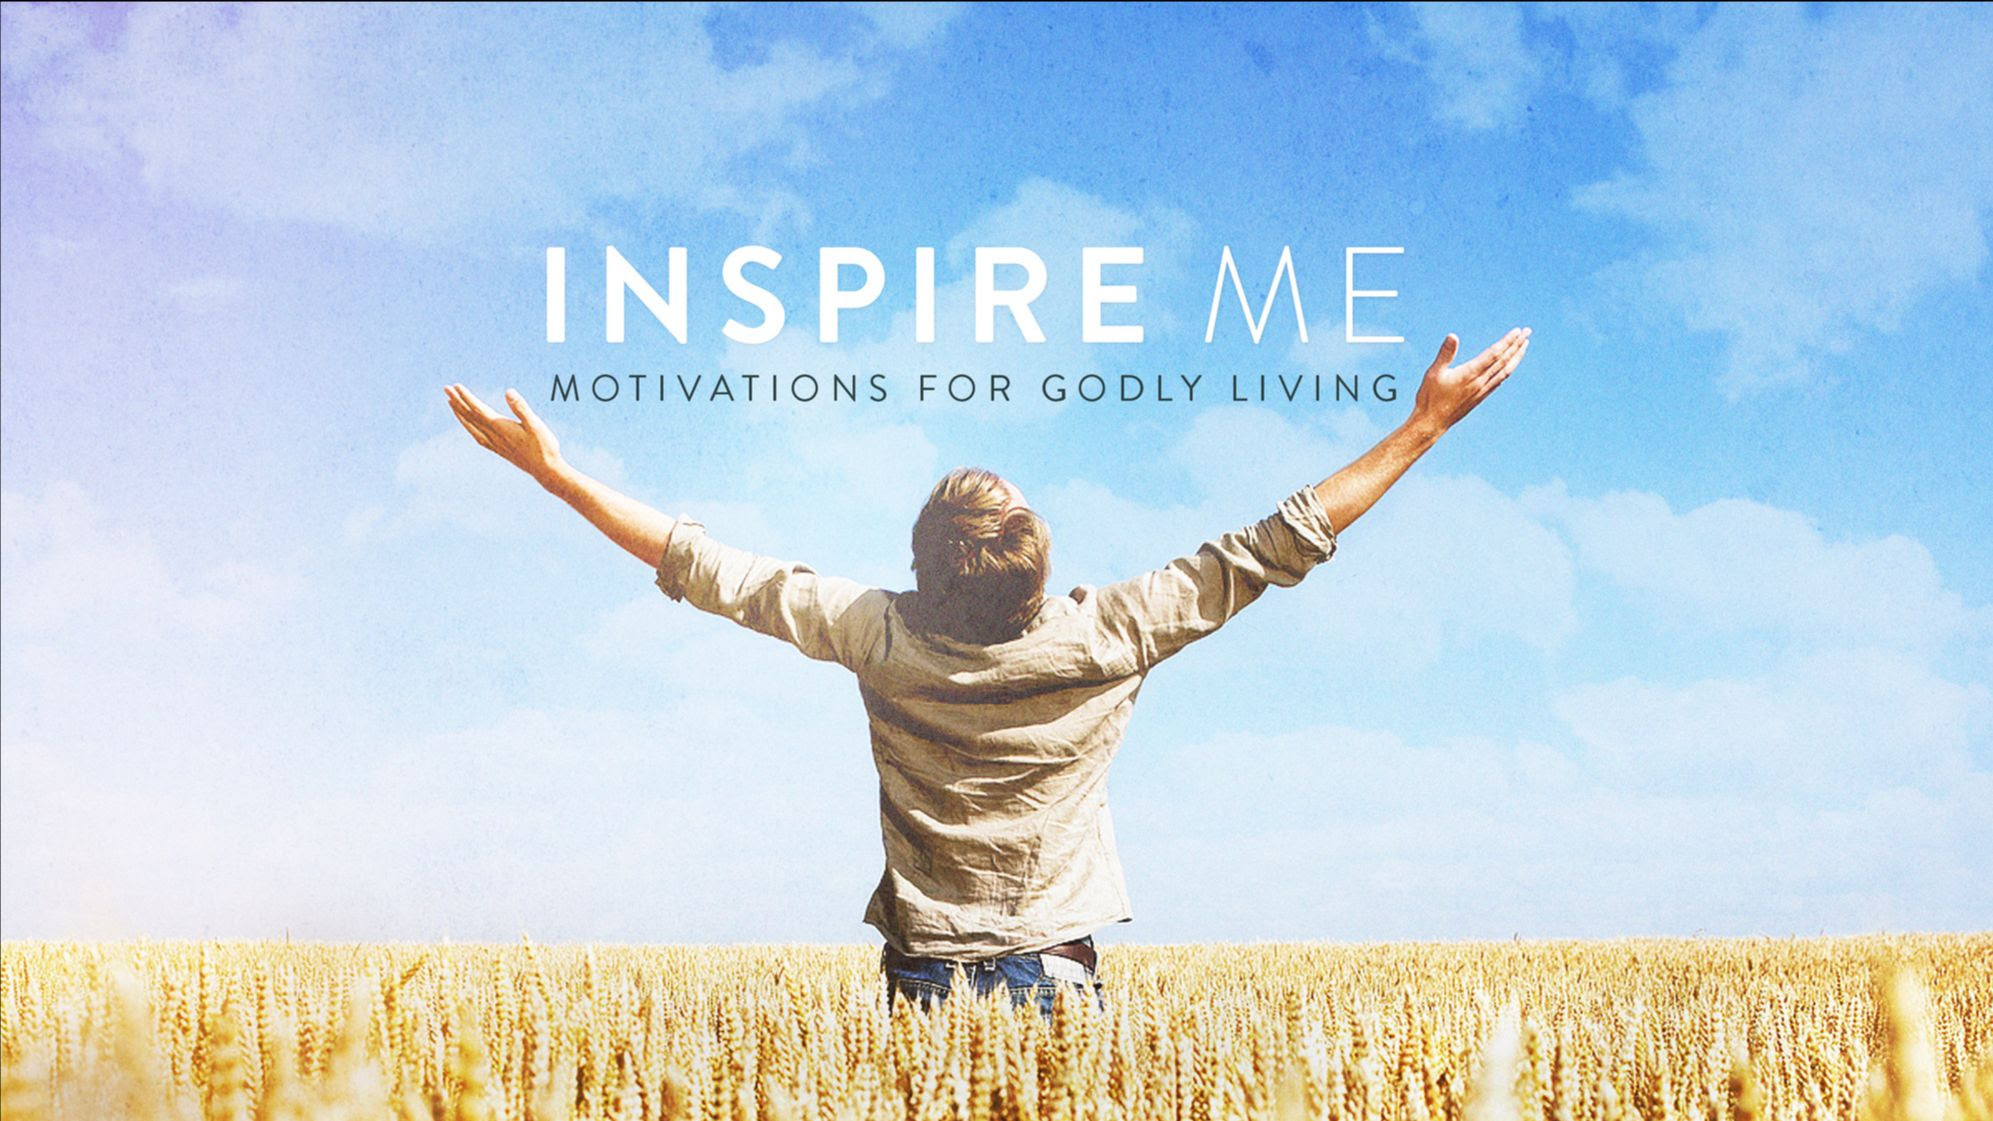 Series: <span>Inspire Me: Motivation for Godly Living</span>